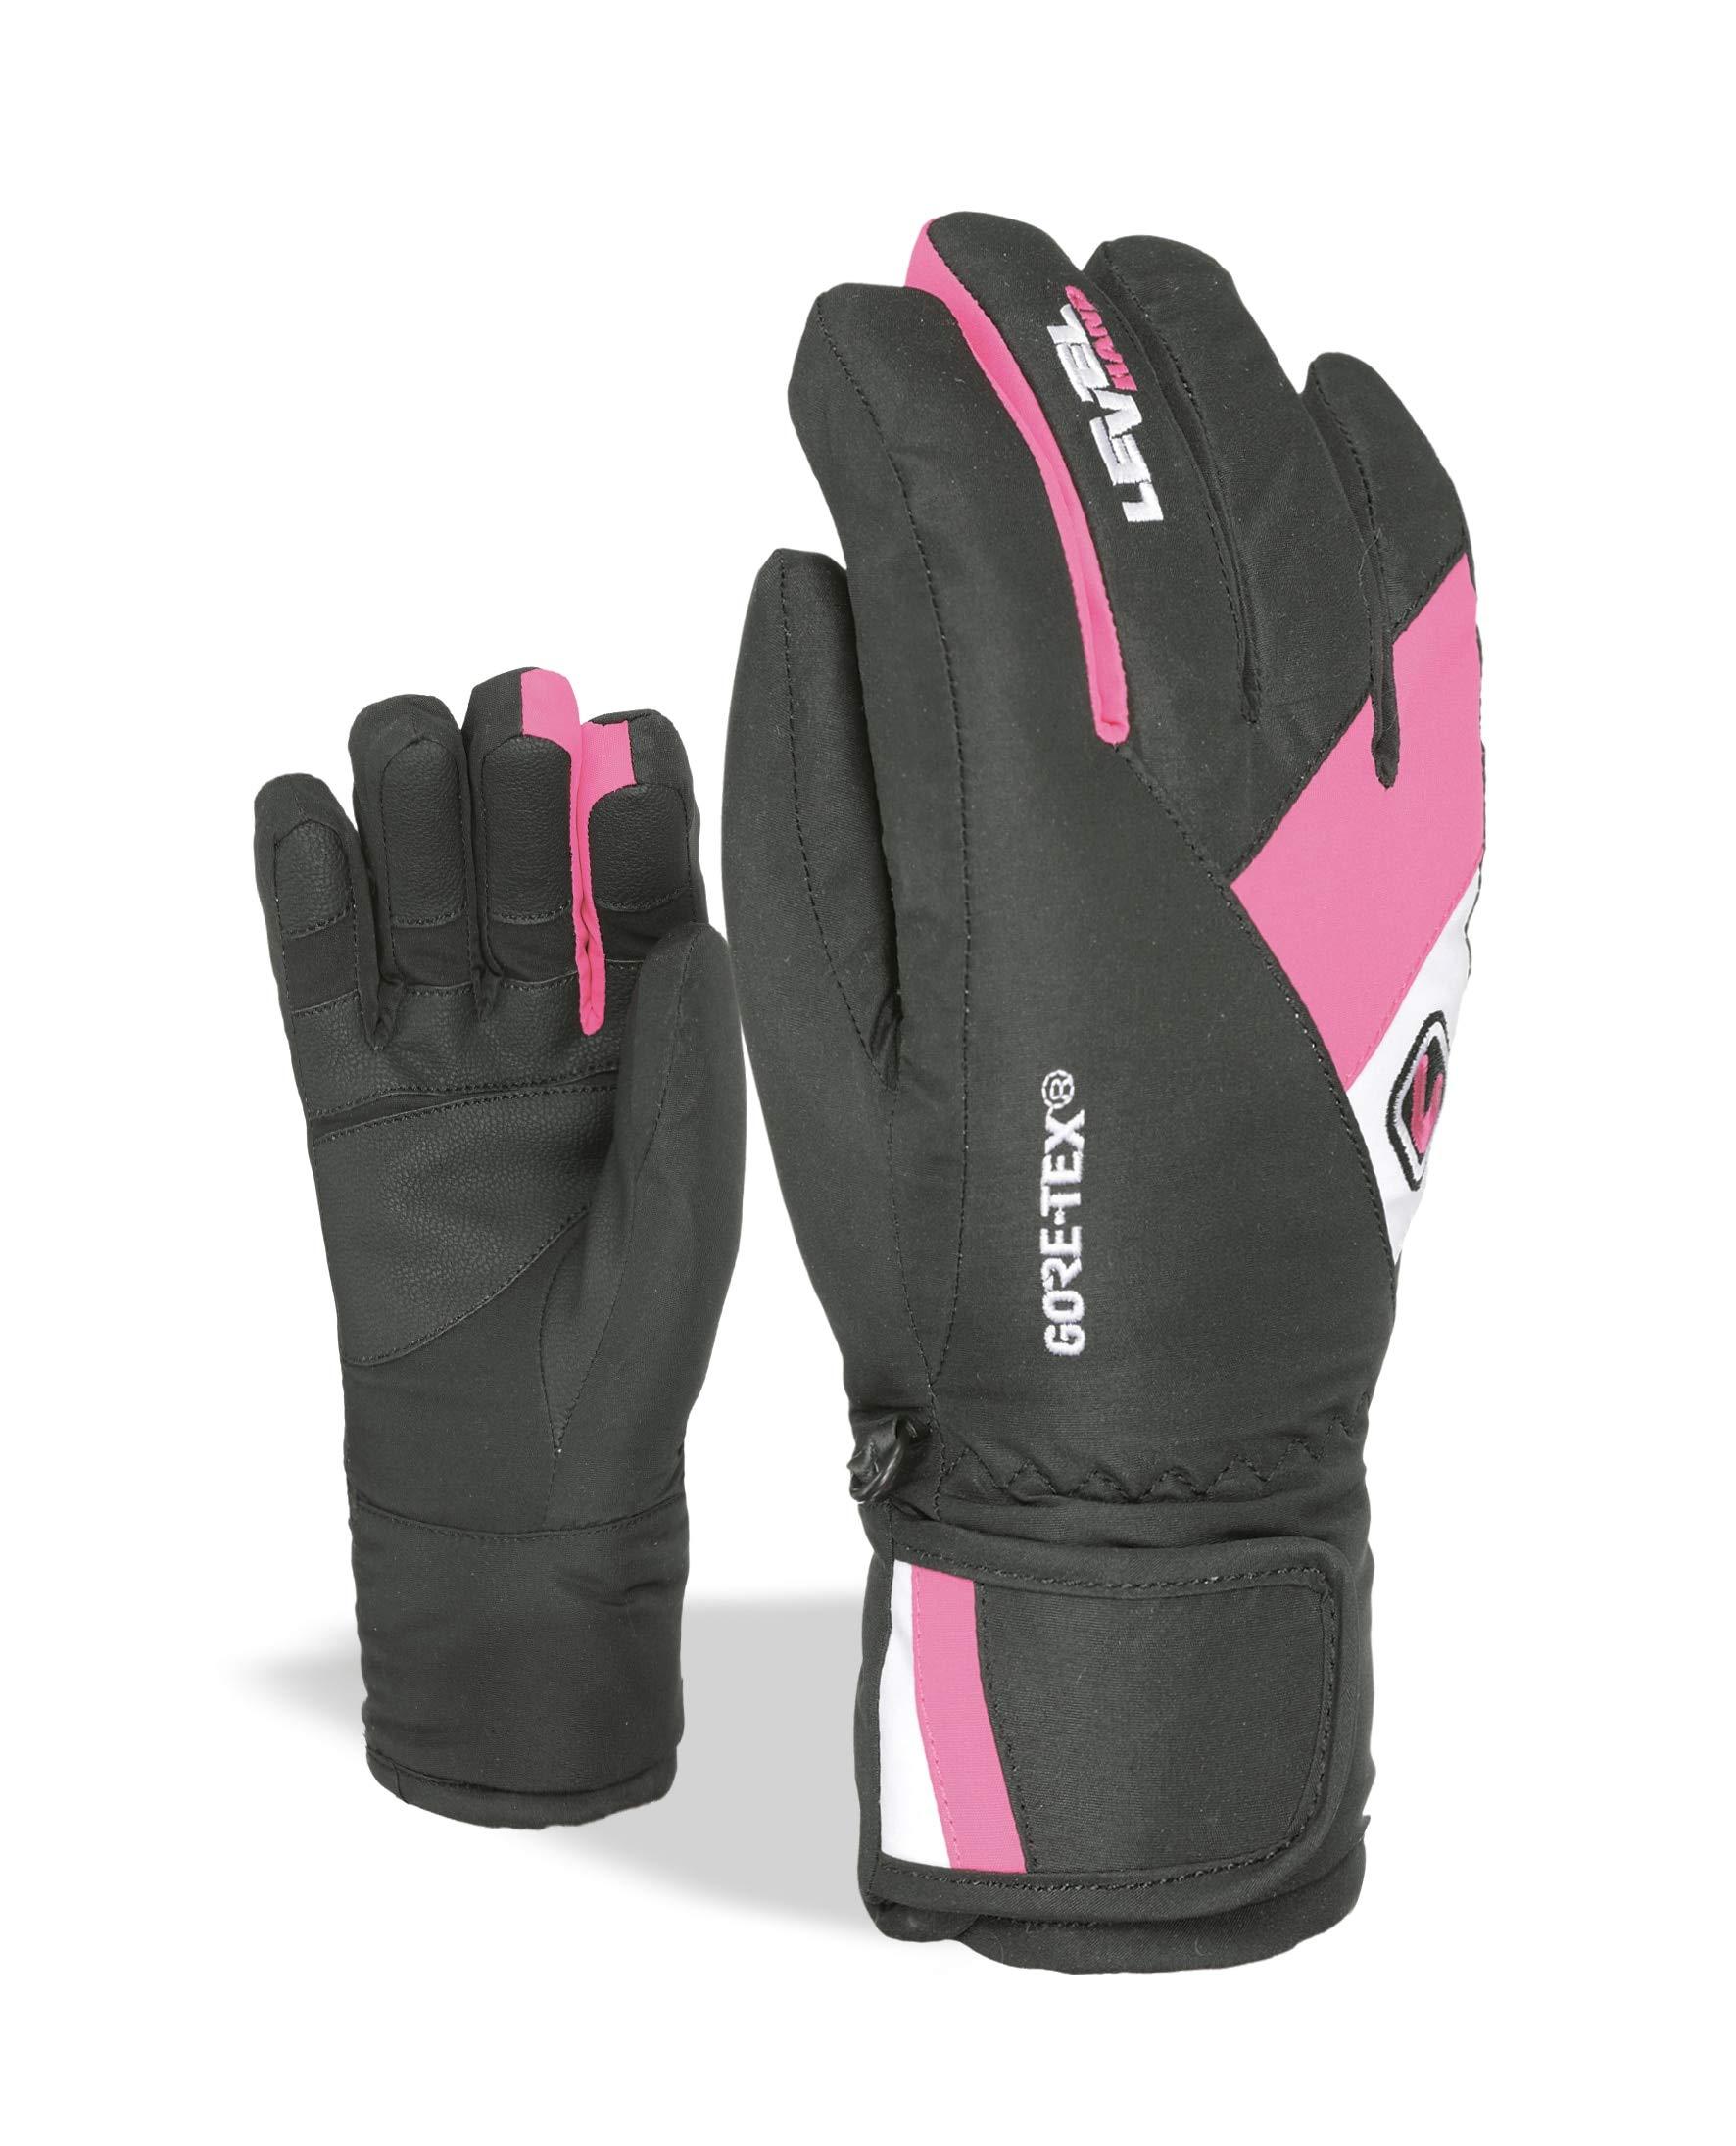 Level Force GORE-TEX Glove Kids